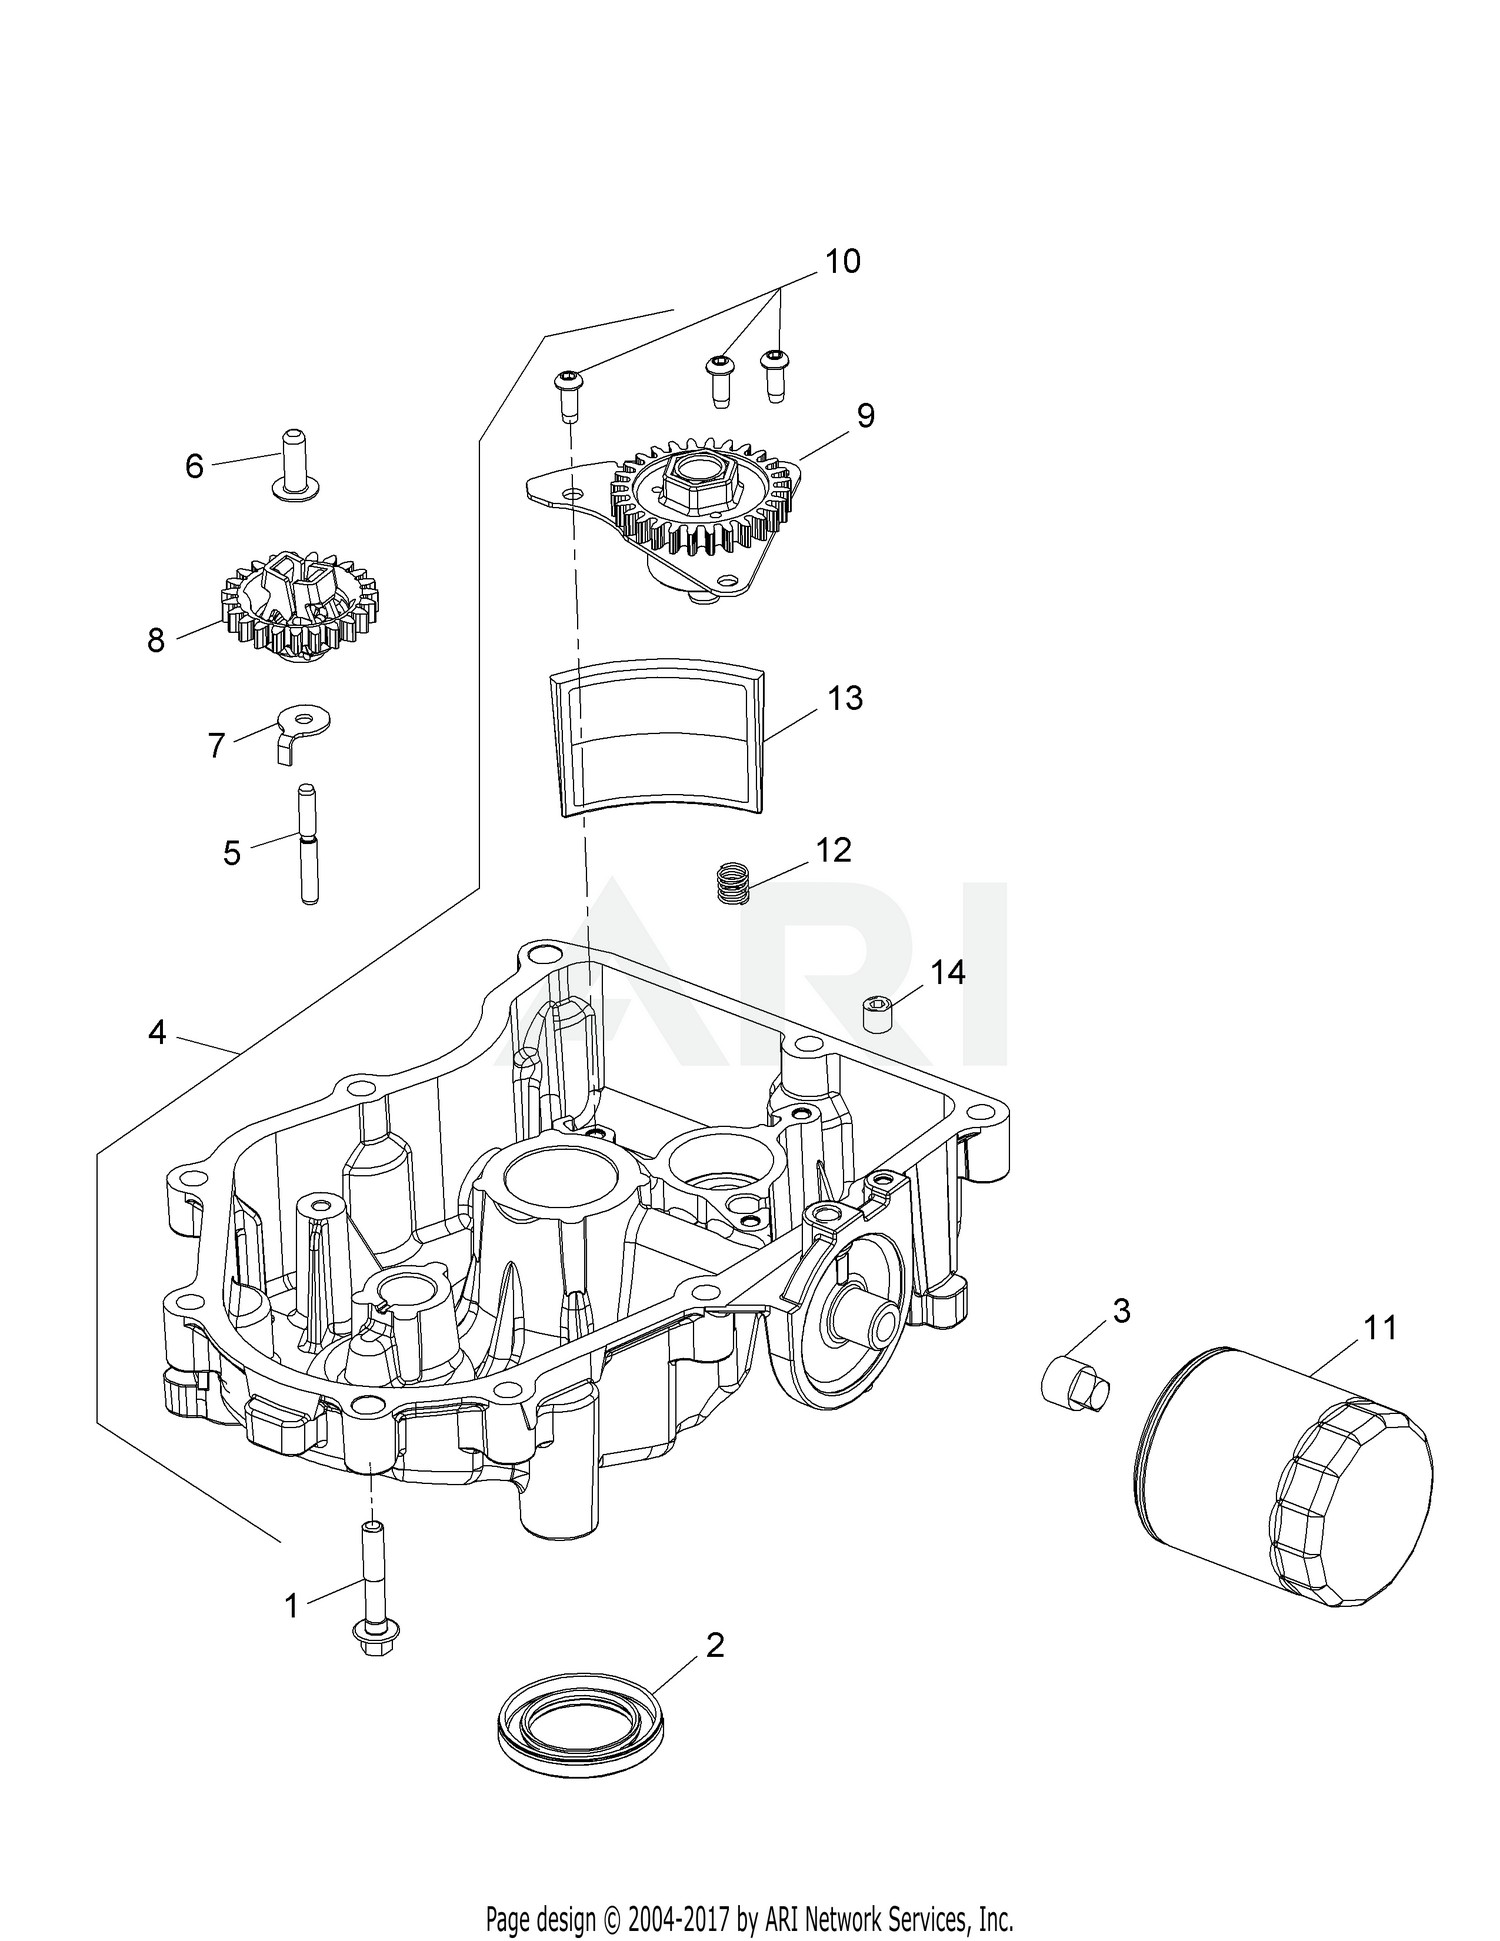 Kohler Engine Parts Diagram Cub Cadet Parts Diagrams Cub Cadet Xt1 Lt54 Fab Tractor 2015 Of Kohler Engine Parts Diagram